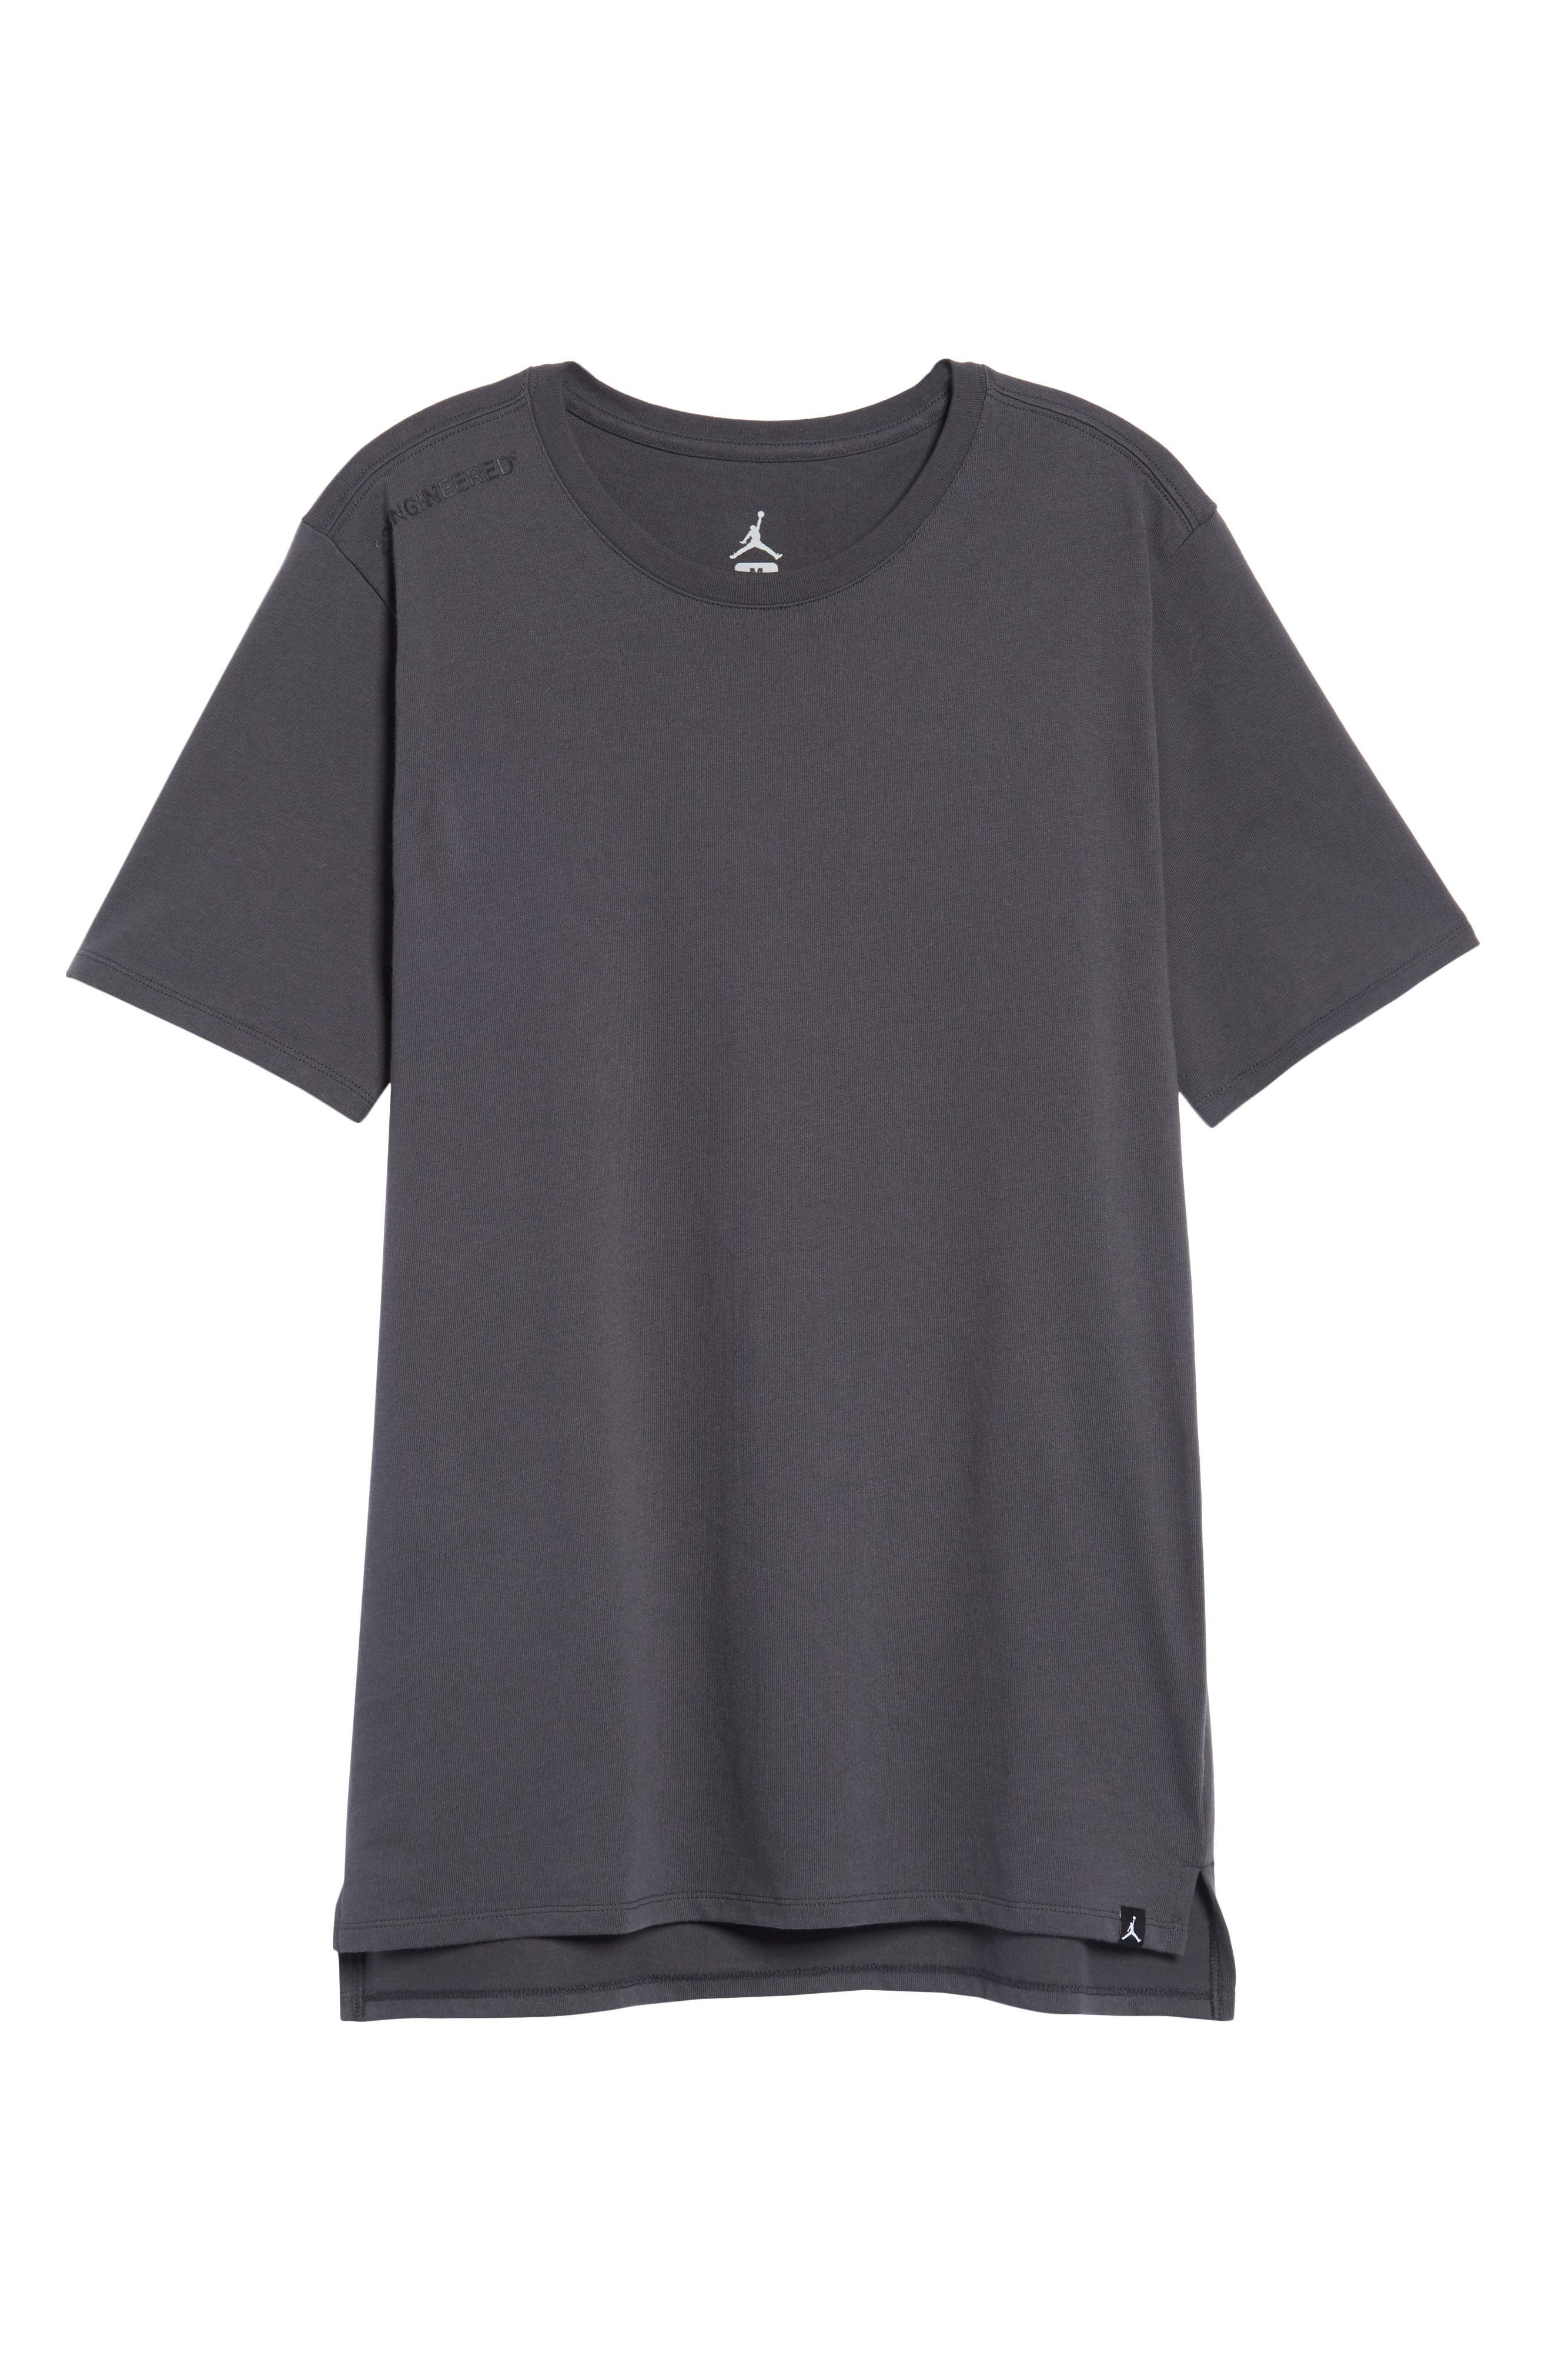 Sportswear 23 Engineered T-Shirt,                             Alternate thumbnail 6, color,                             060